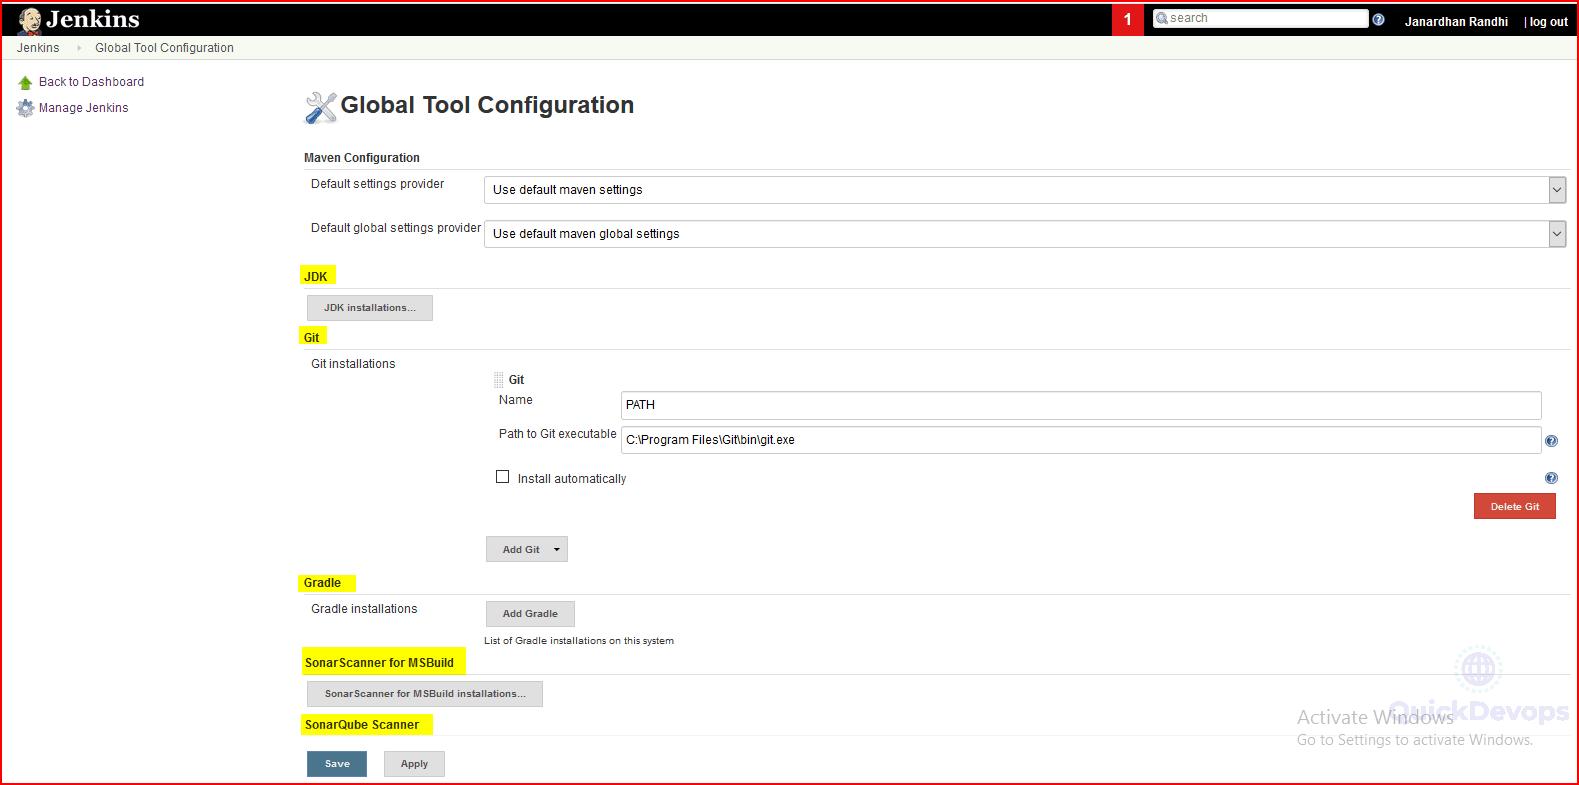 GobaltoolConfiguration